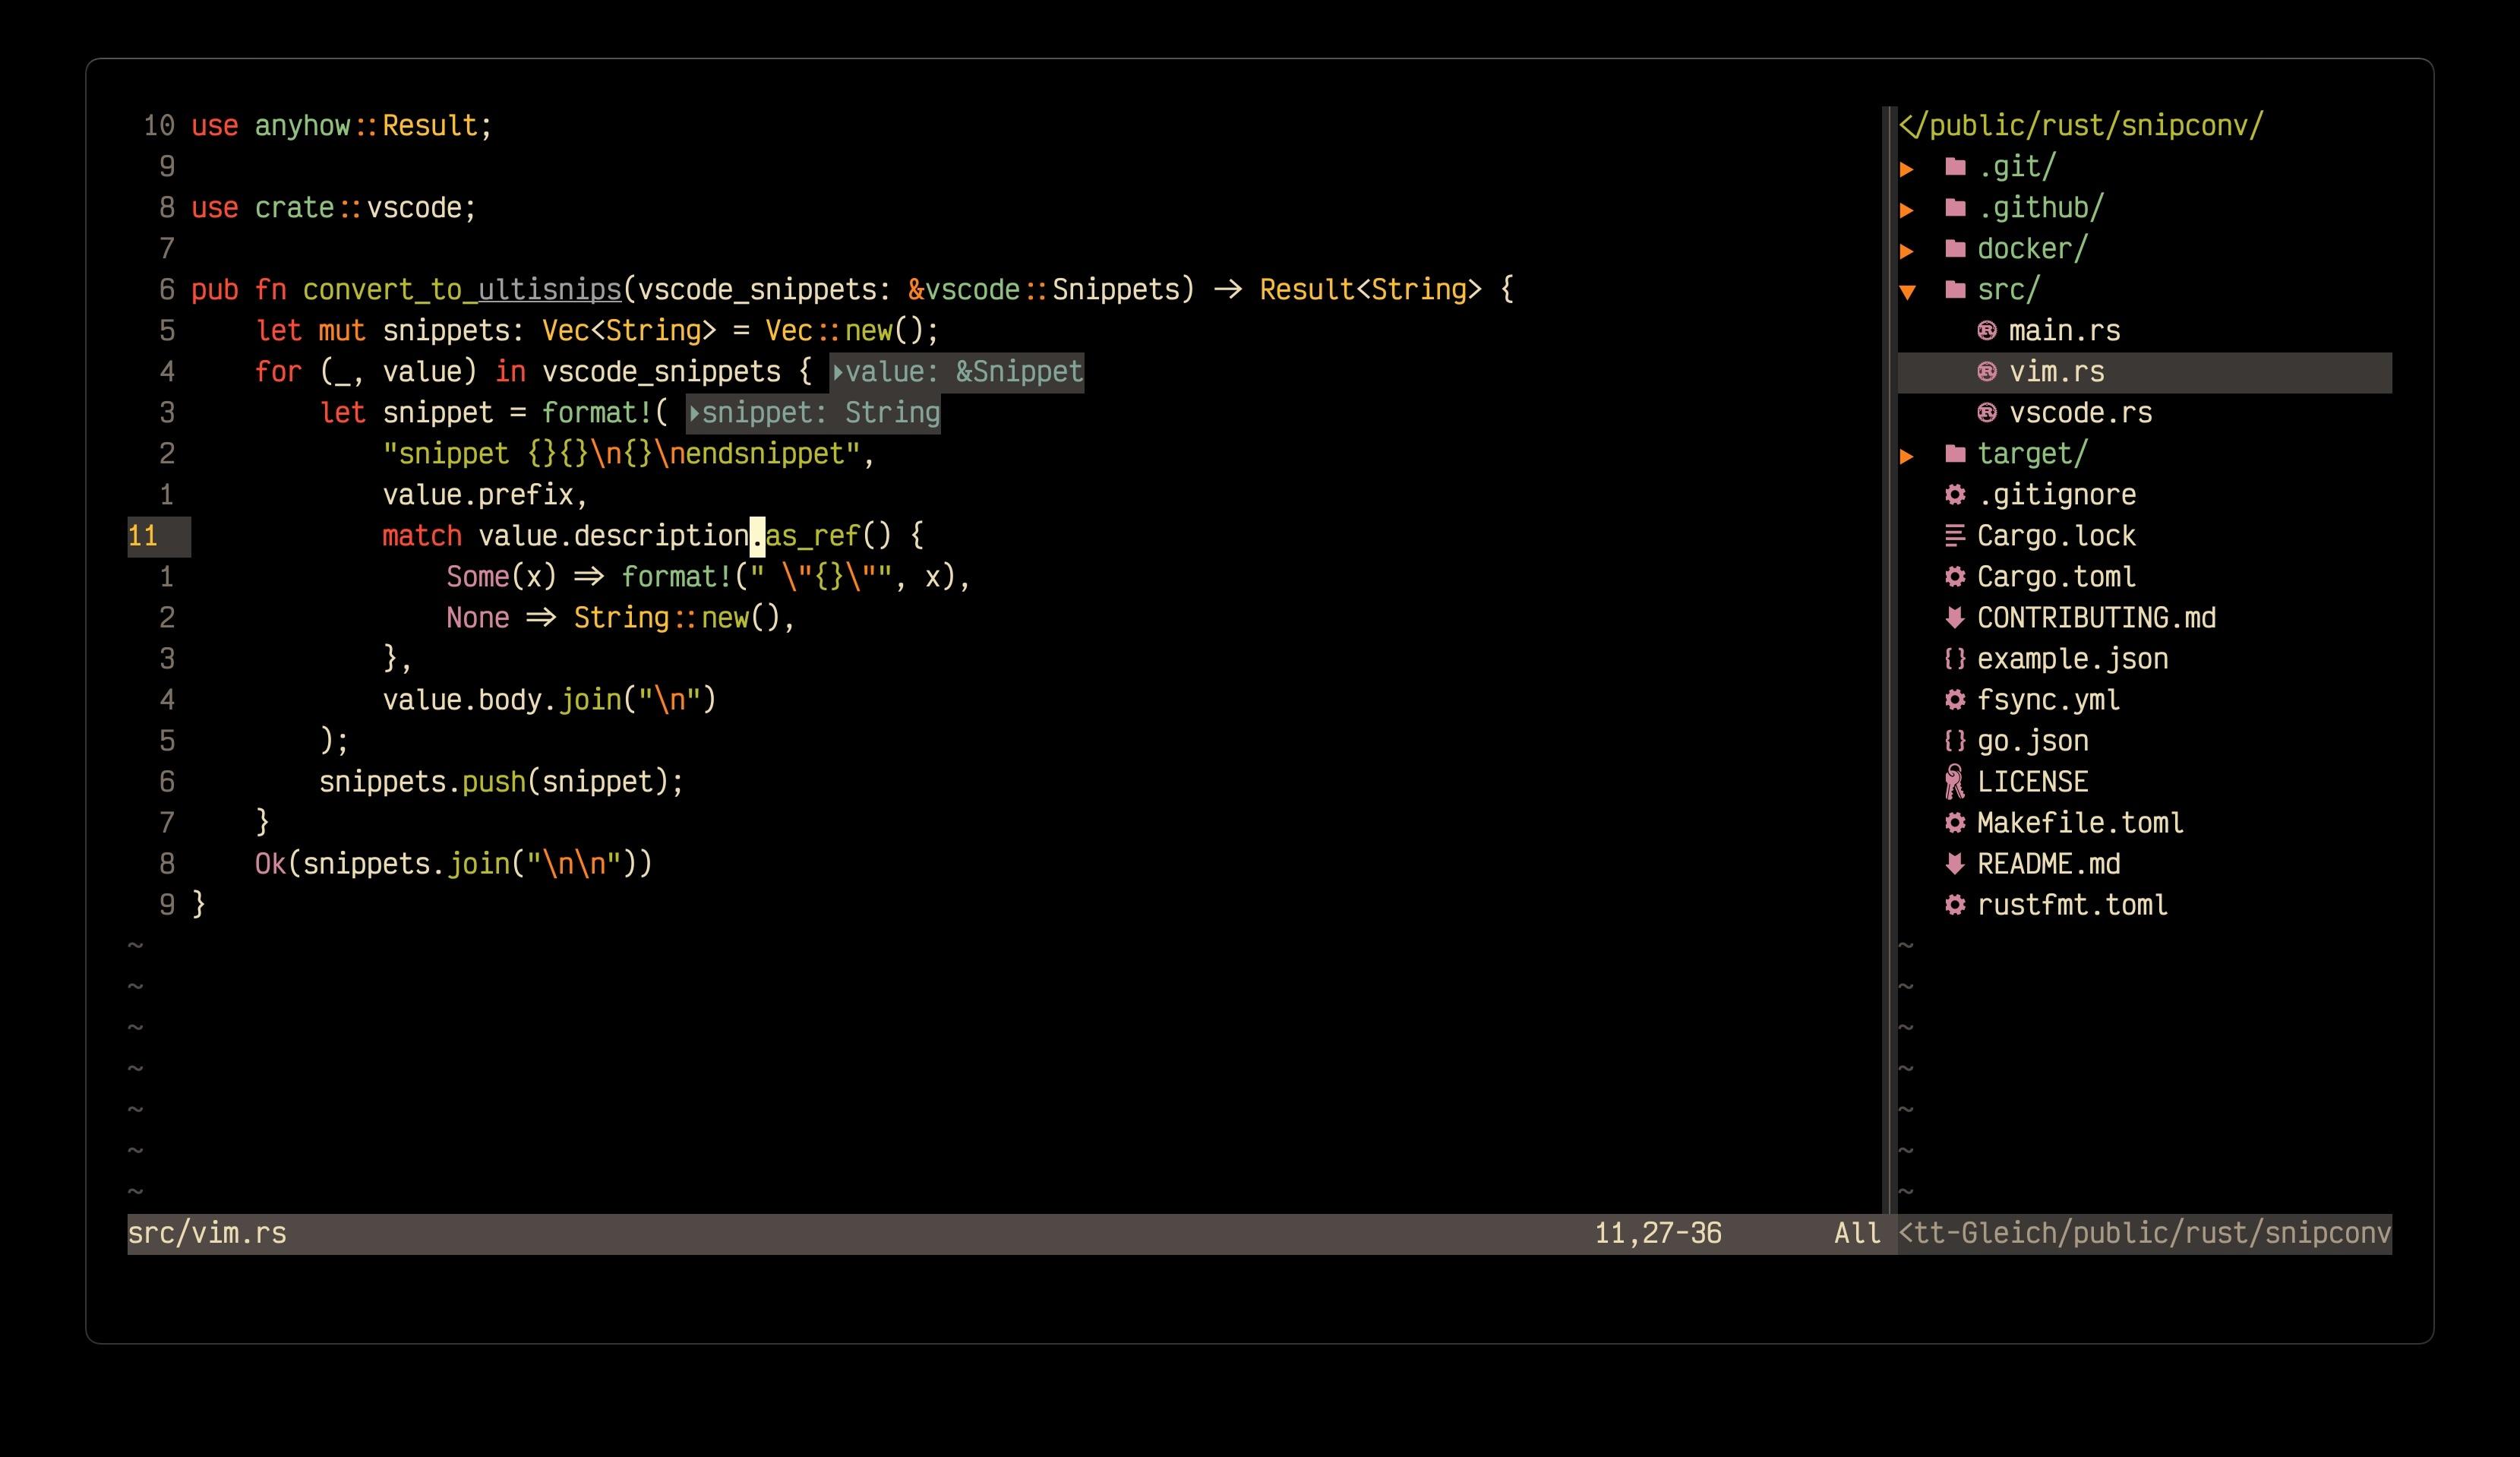 https://cloud-4woth0iy1-hack-club-bot.vercel.app/0screen_shot_2021-05-11_at_3.19.14_pm.jpg